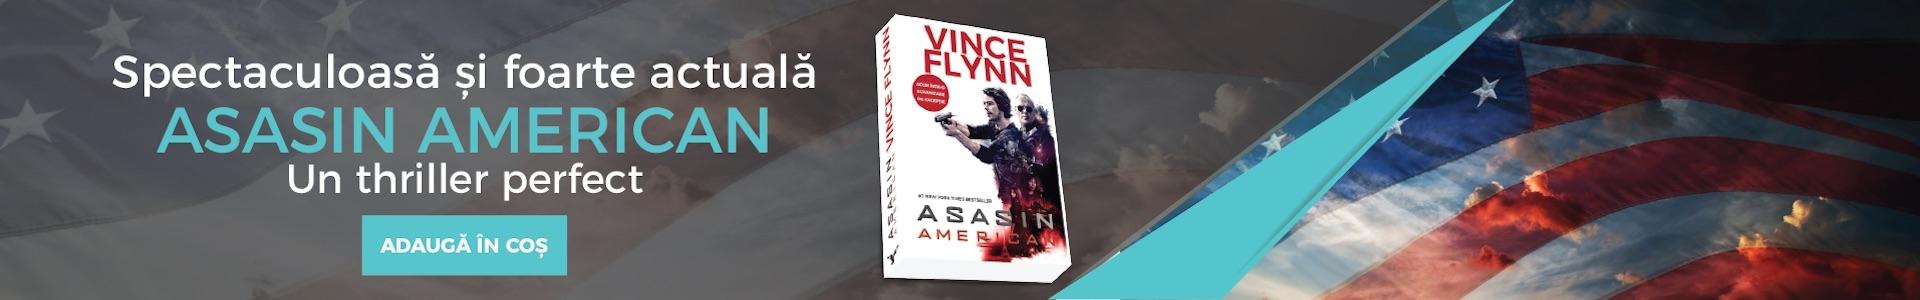 Asasin american | Vince Flynn | Seria Mitch Rapp volumul 1